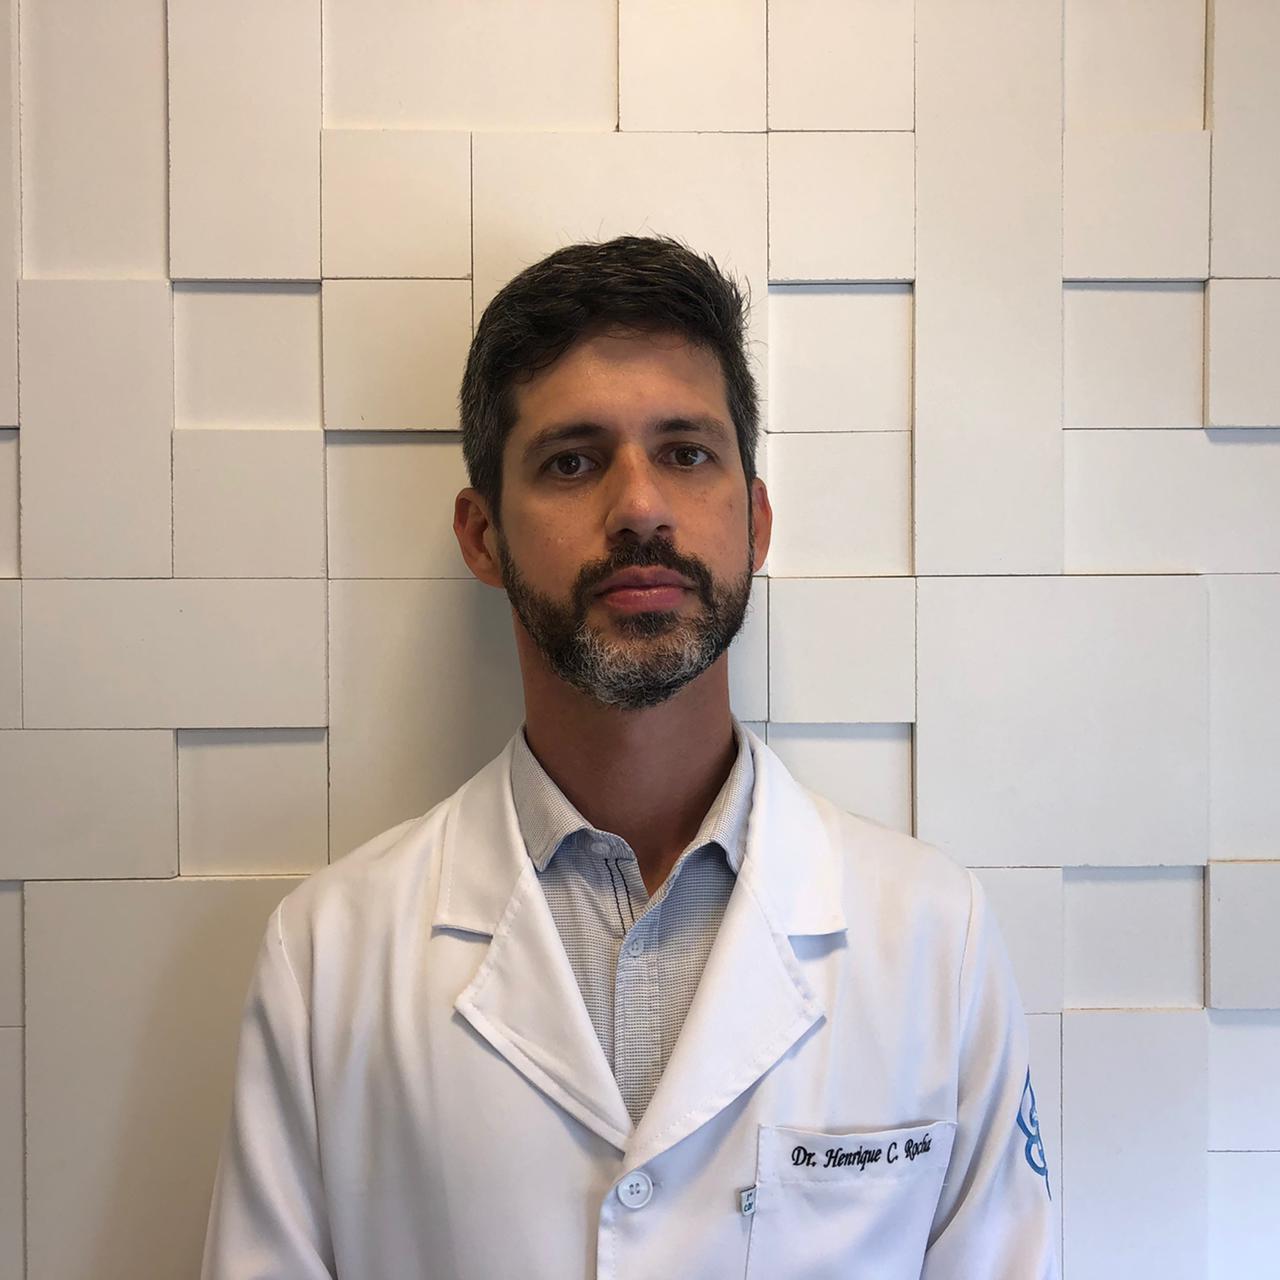 Dr. Henrique Carvalho Rocha